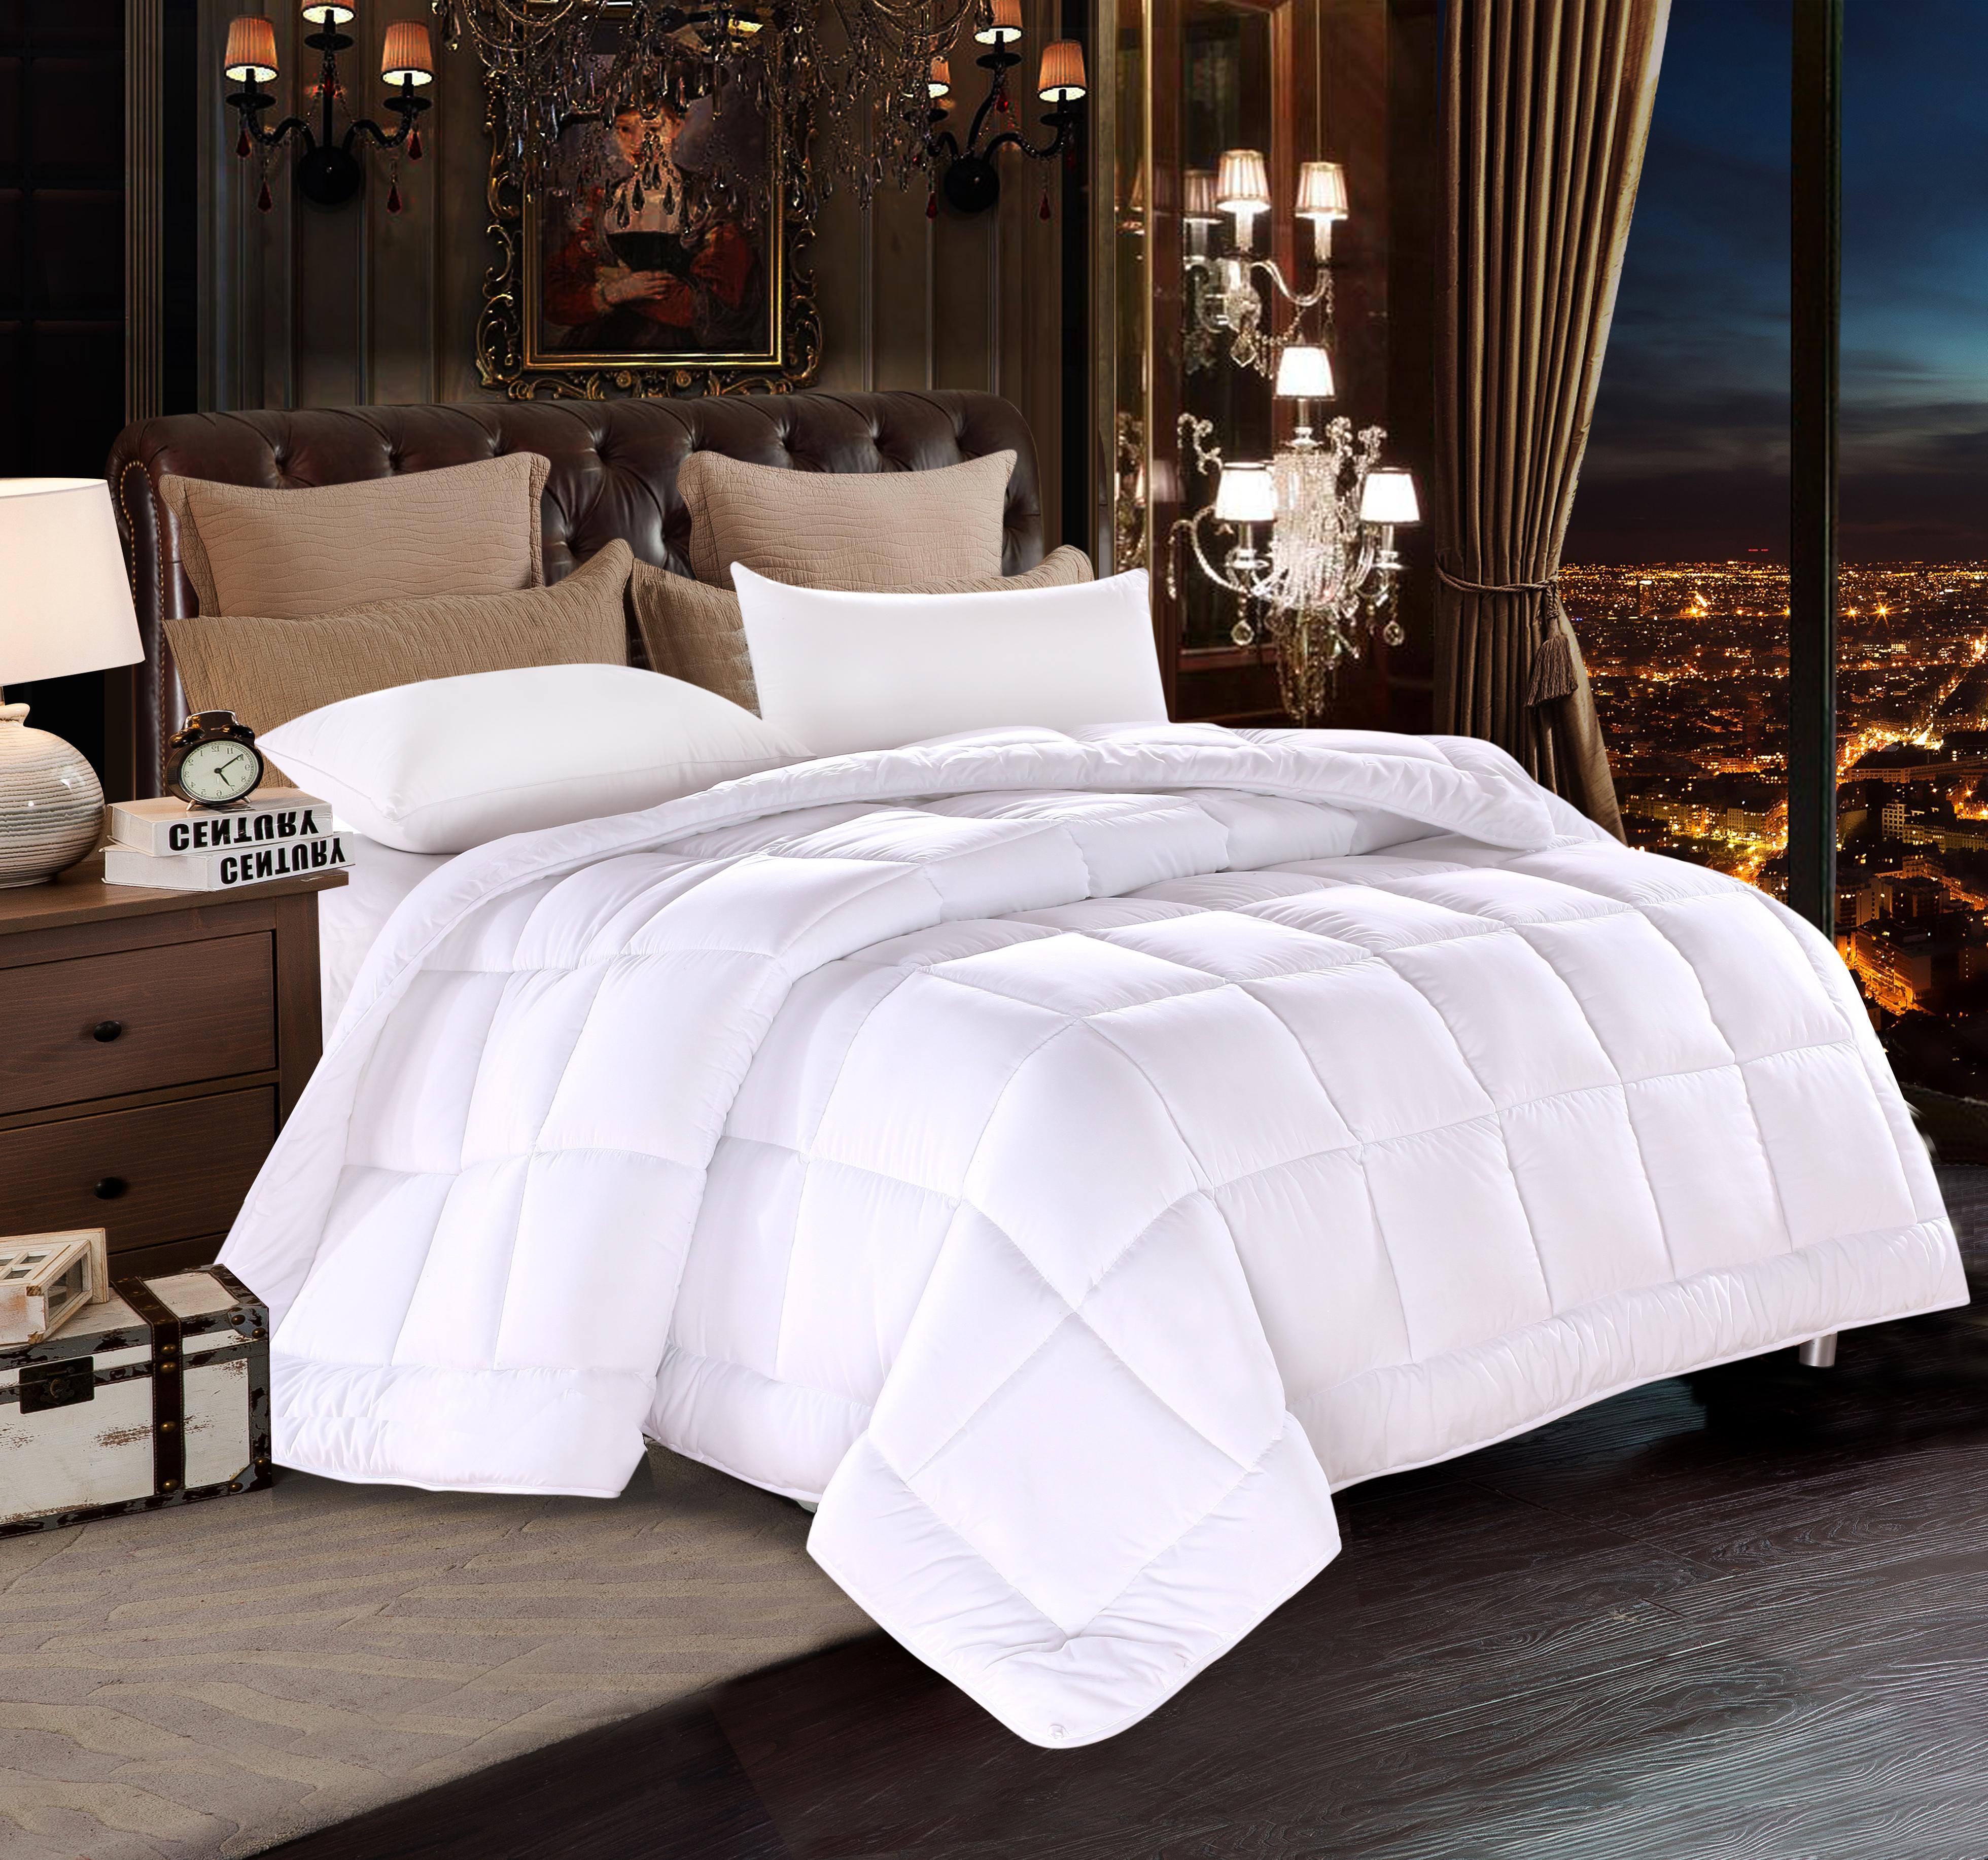 pinterest alternative pin insert comforter duvet comforters down products light weight inserts